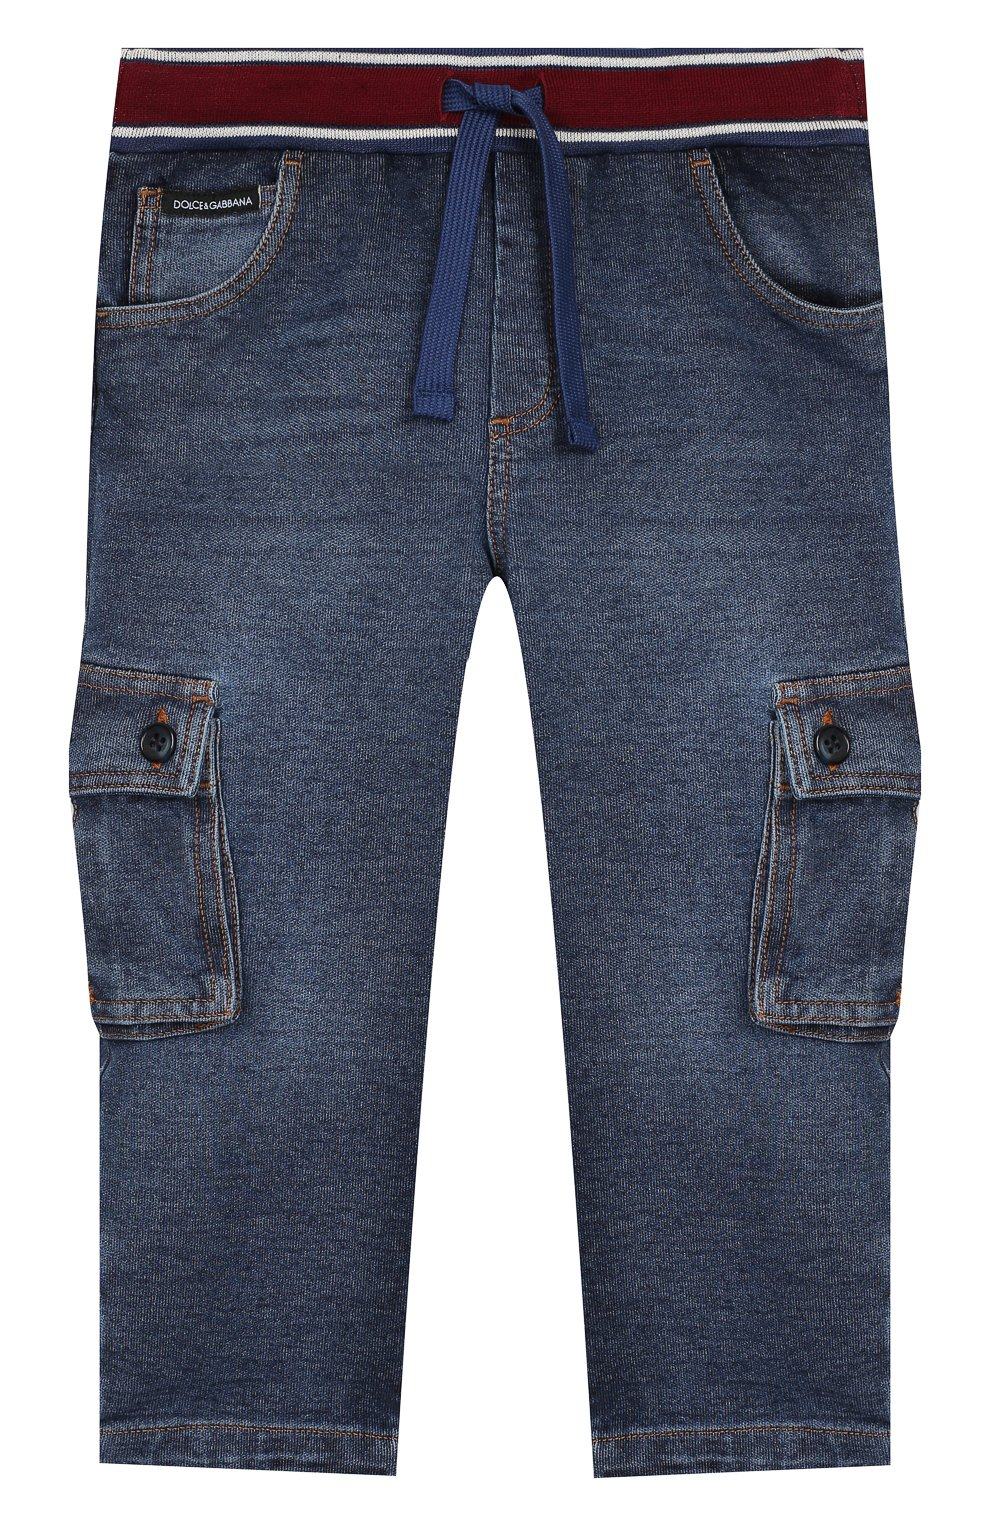 Детские джинсы DOLCE & GABBANA синего цвета, арт. L1JPAV/G7VMW   Фото 1